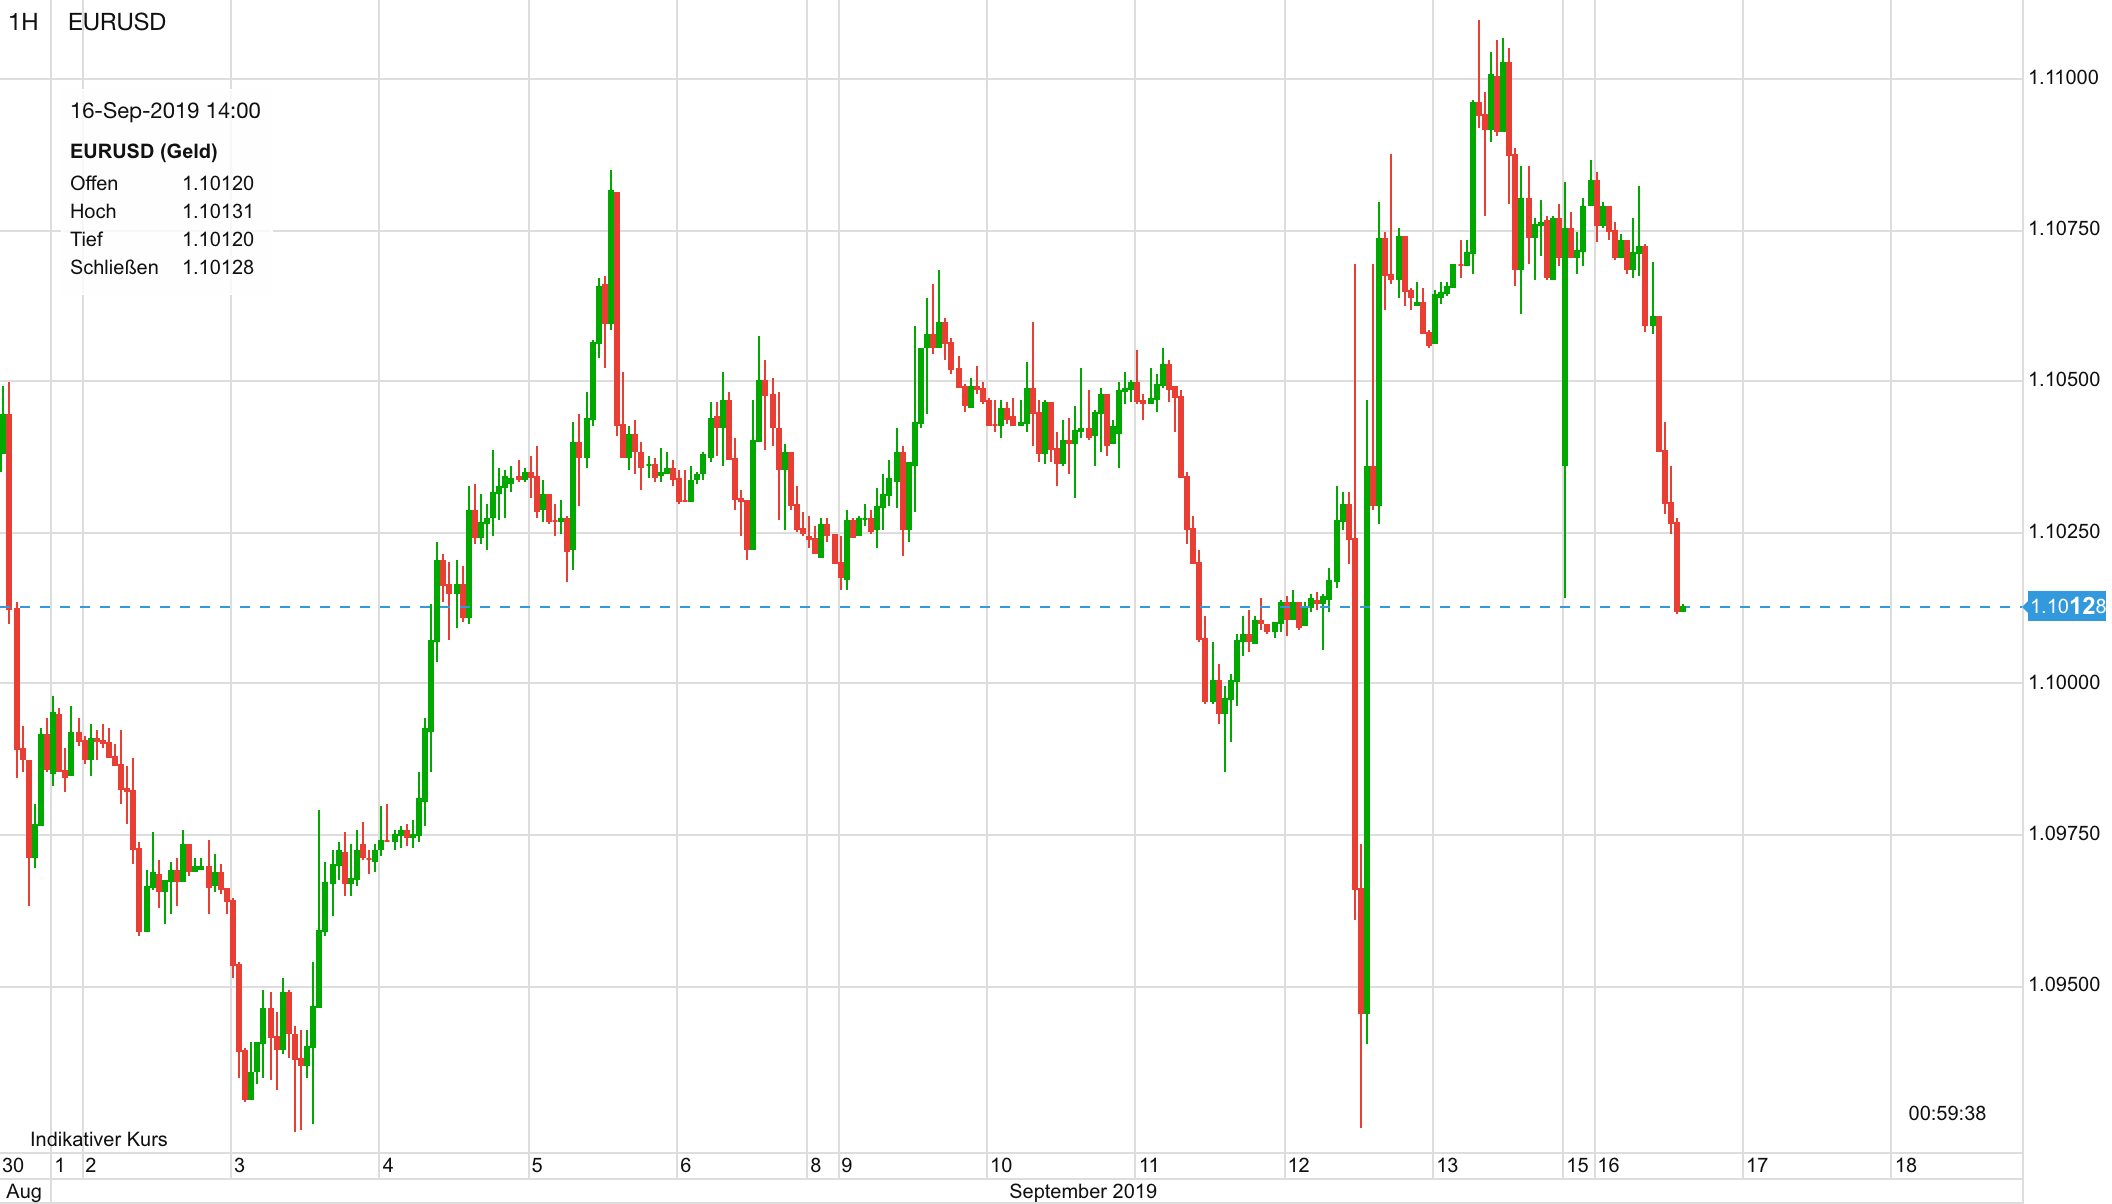 Euro vs USD seit 1. September